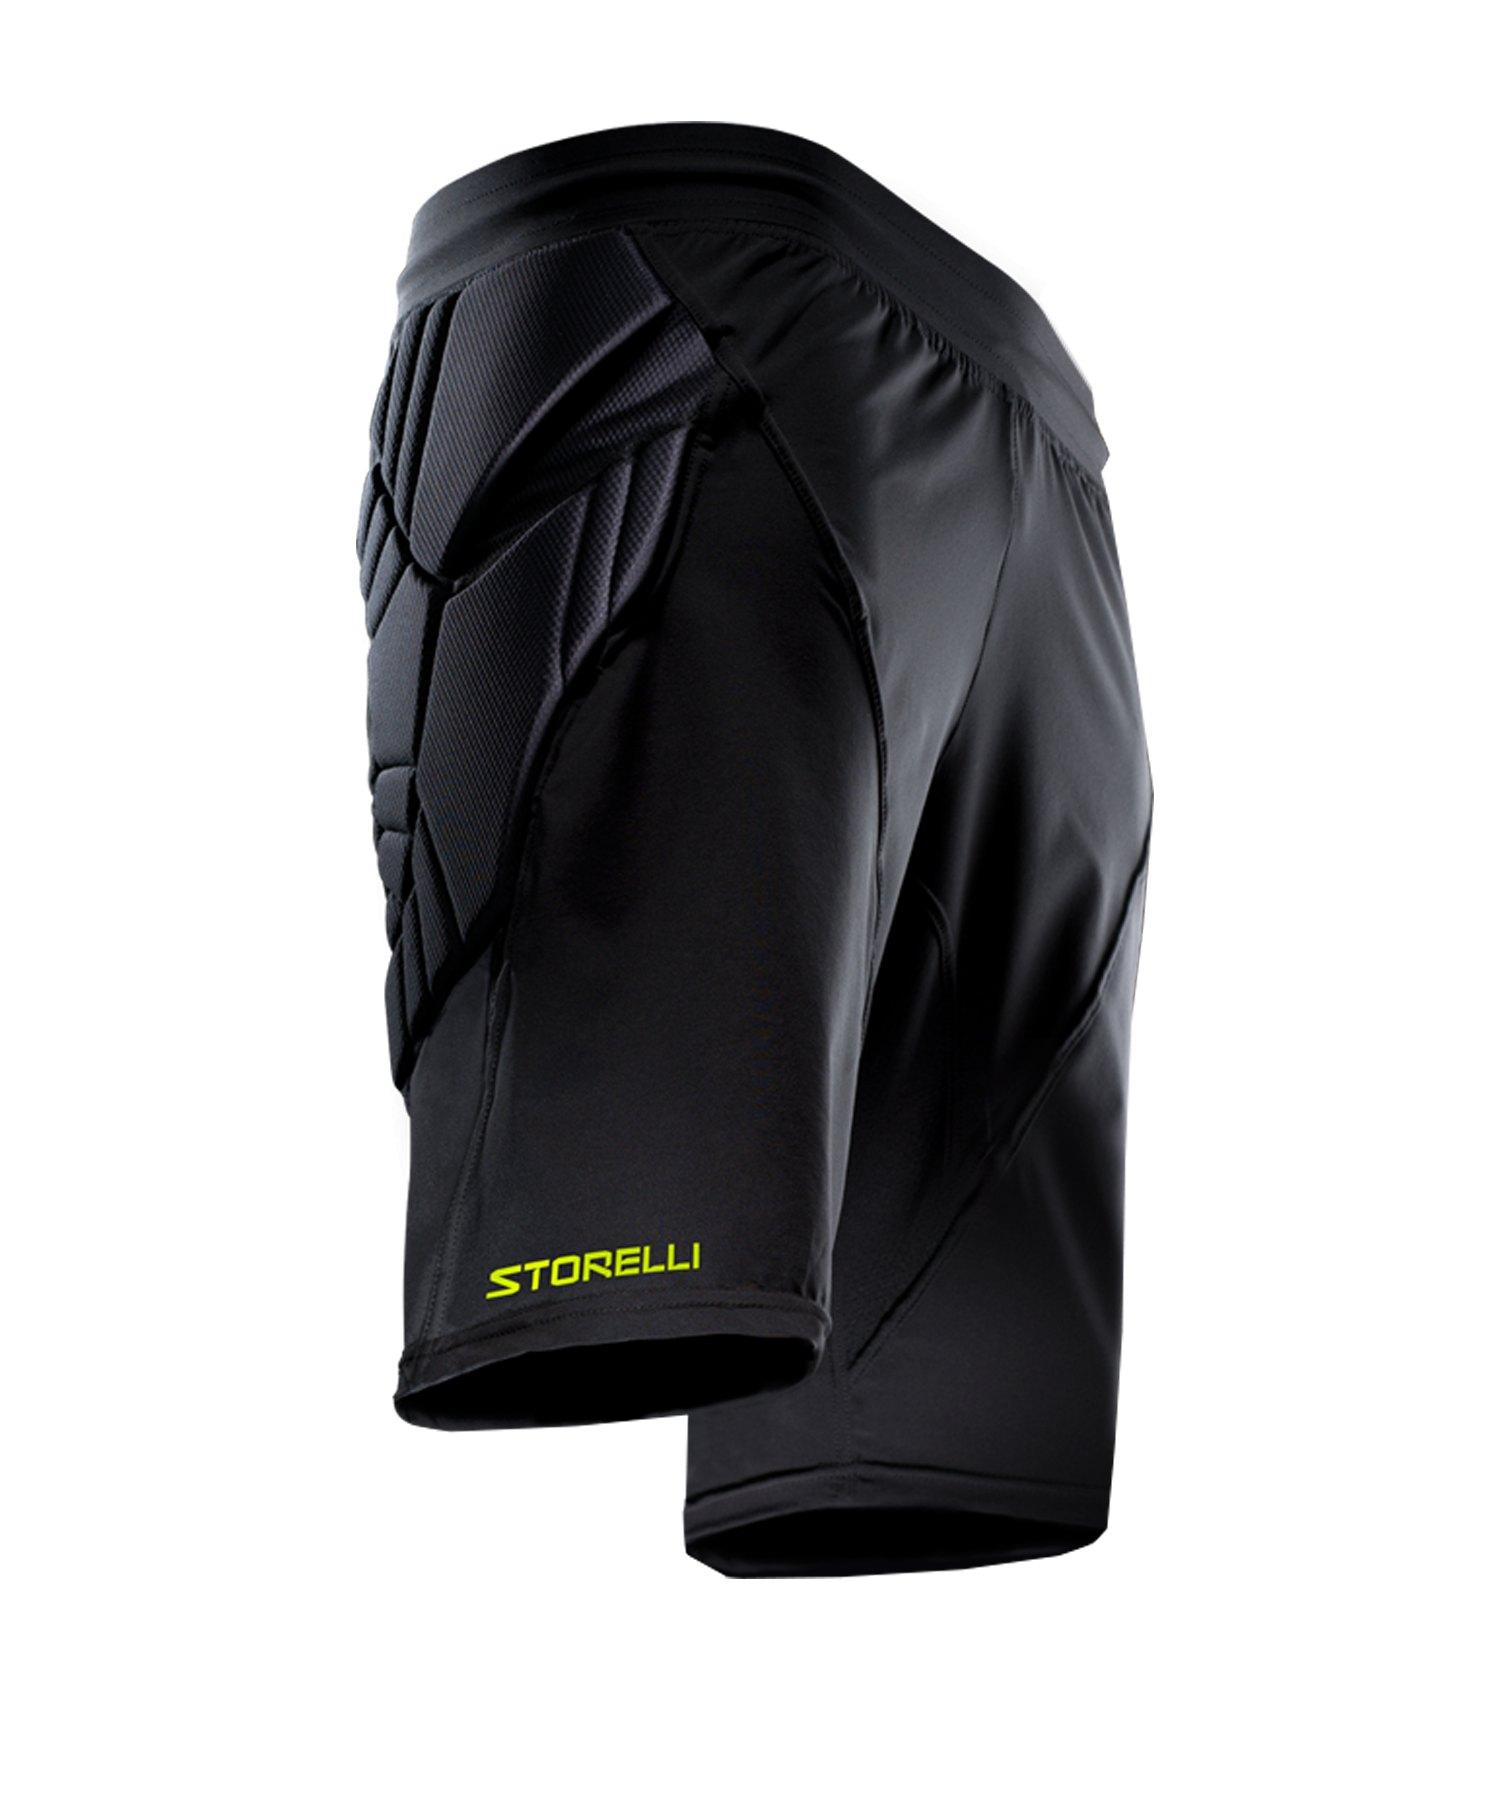 Storelli Bodyshield GK Short Schwarz - schwarz